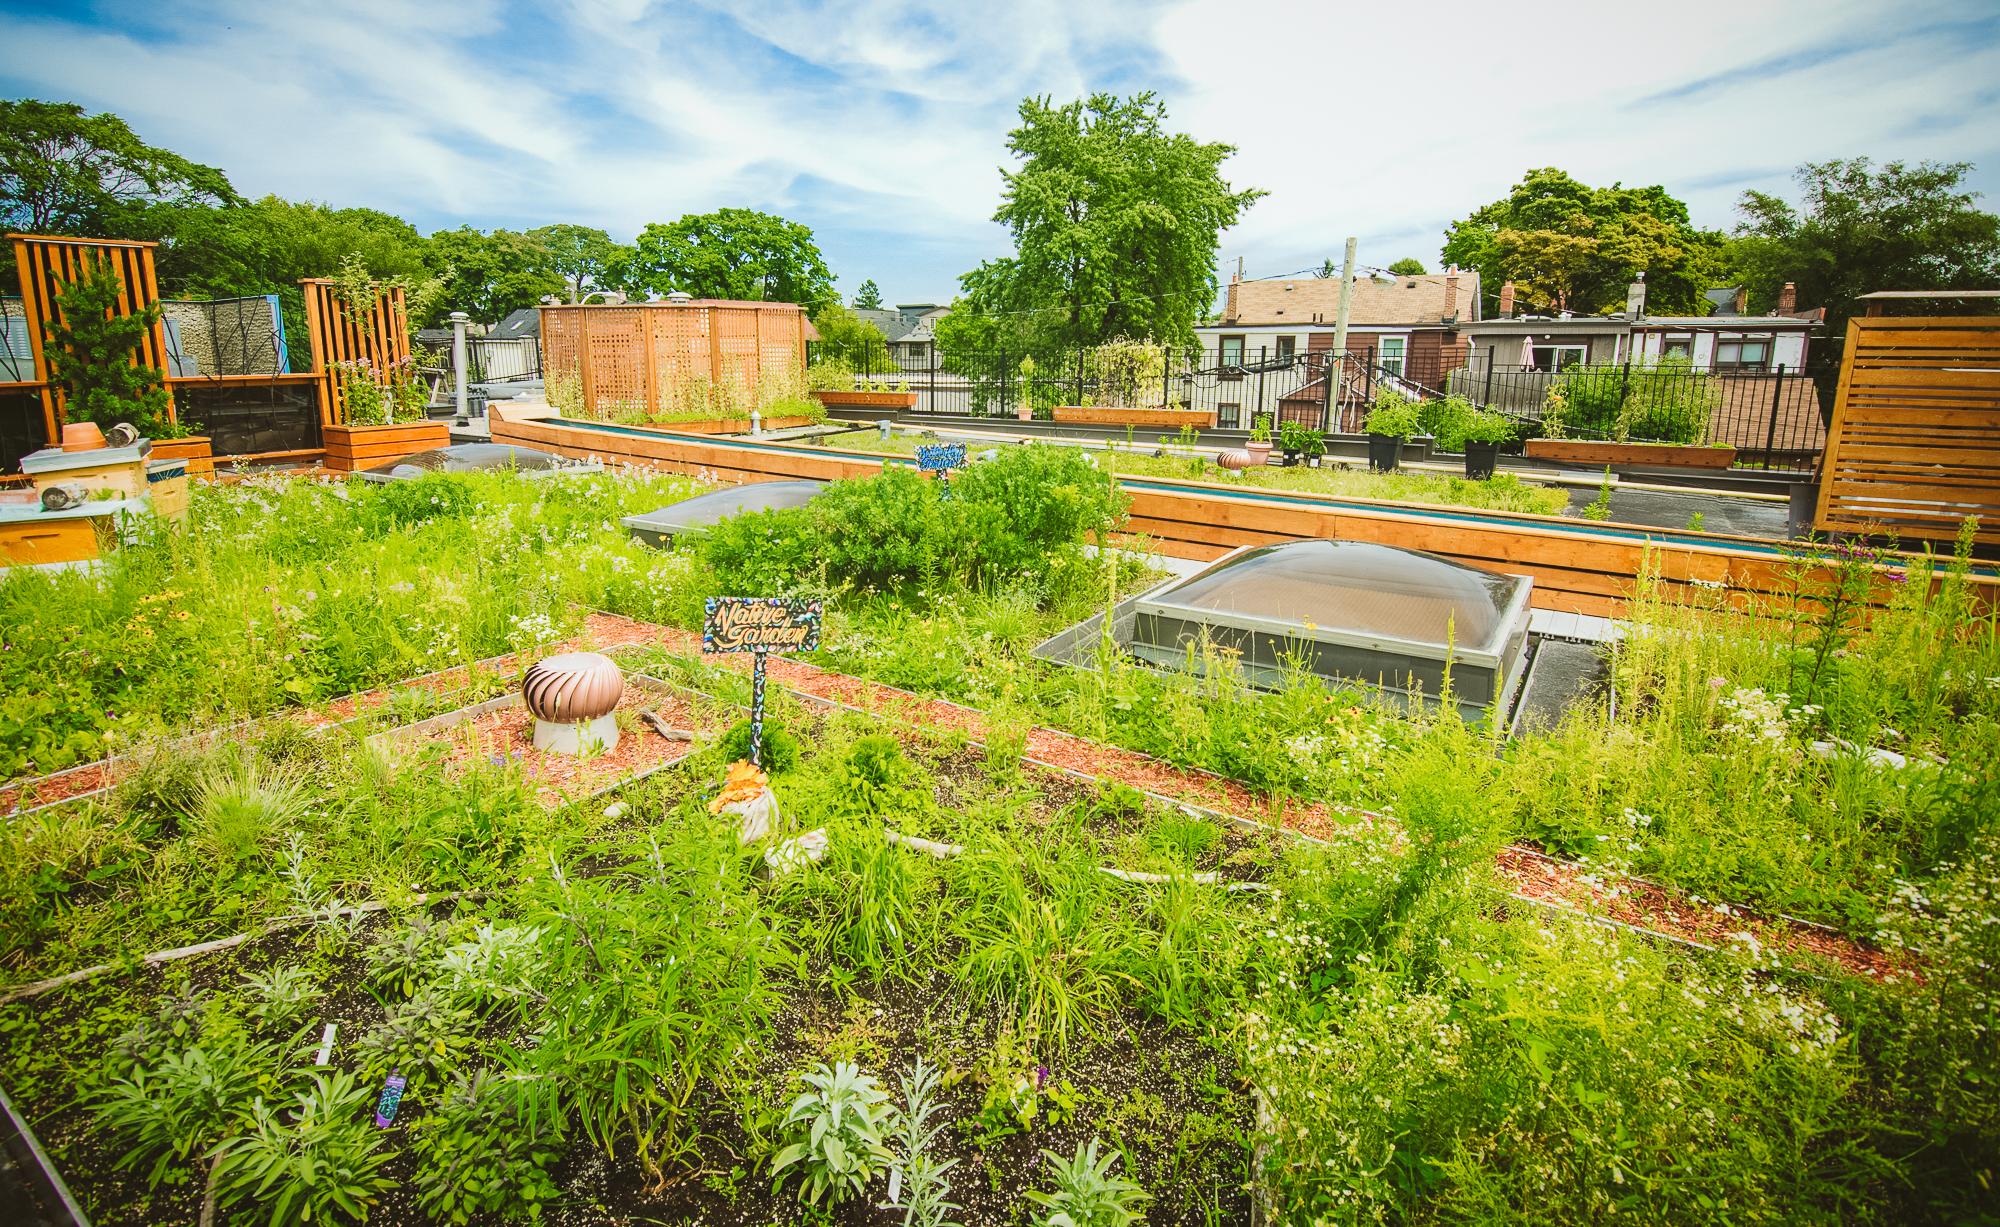 The Big Carrot community garden.